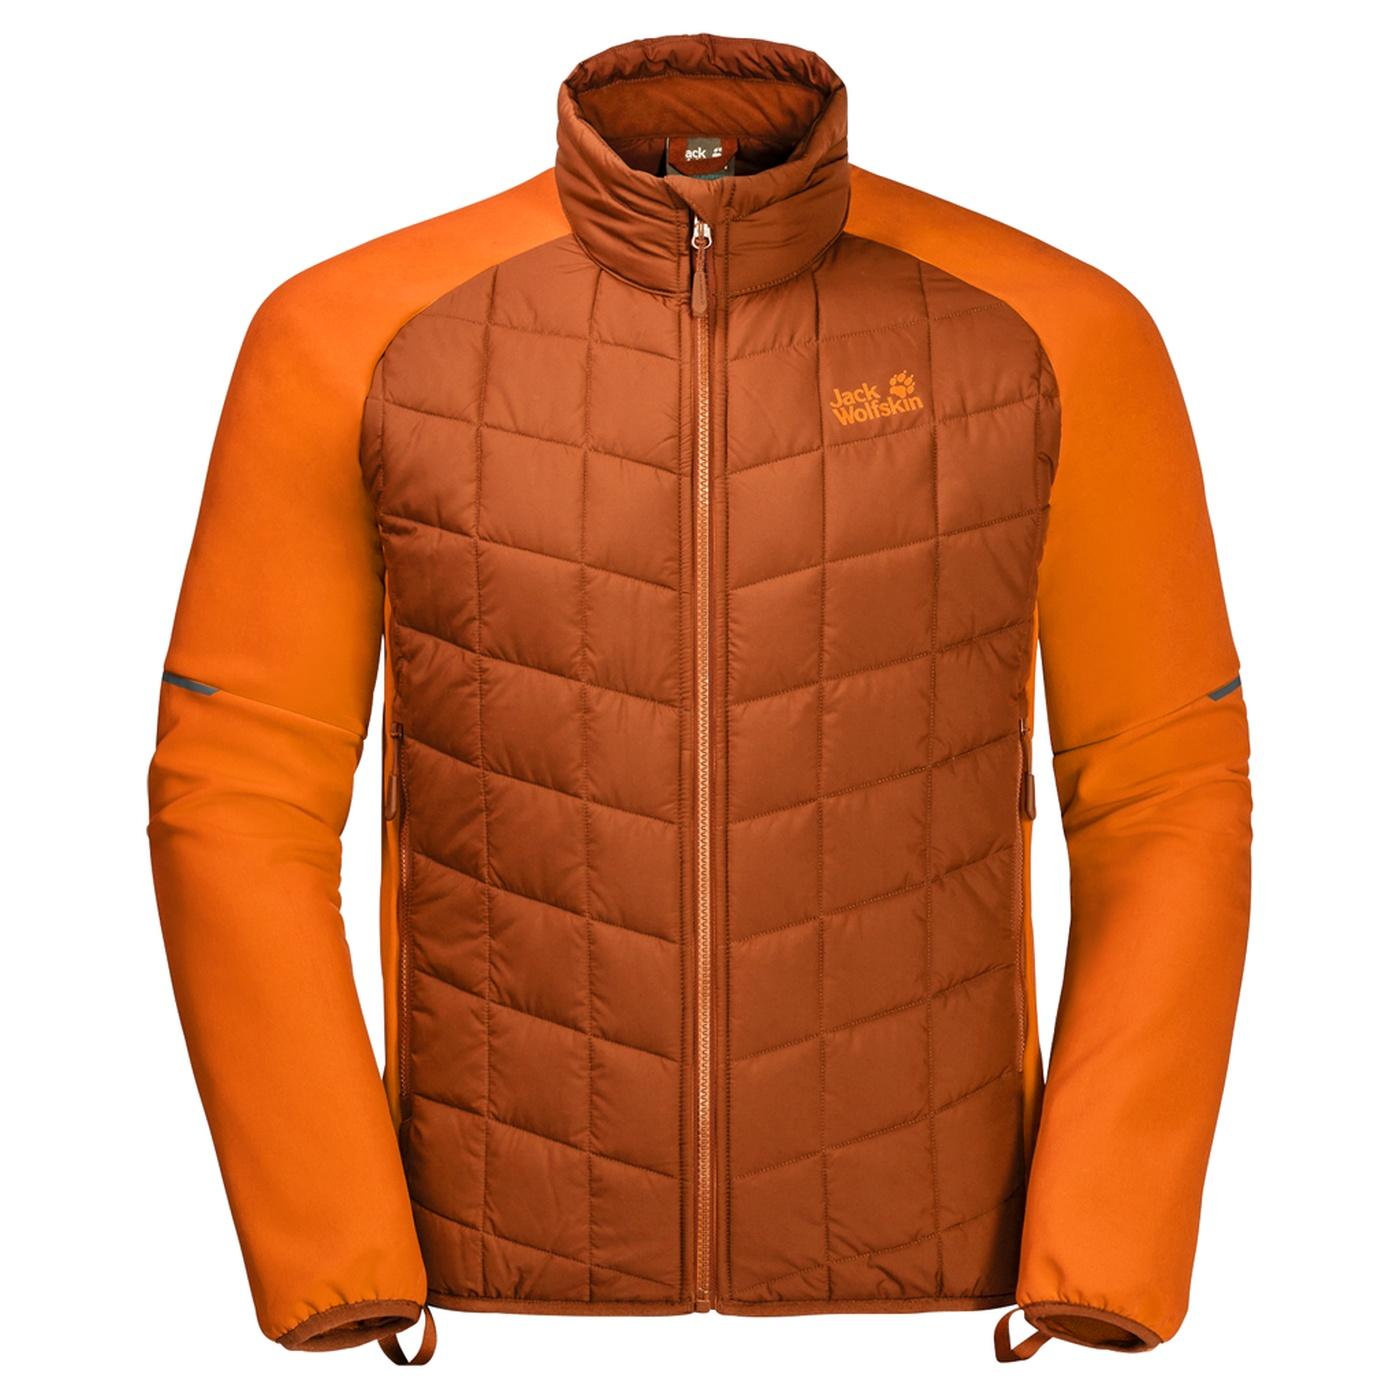 d45b16f6ce1 Jack Wolfskin Grassland Hybrid Jacket M sequoia - us